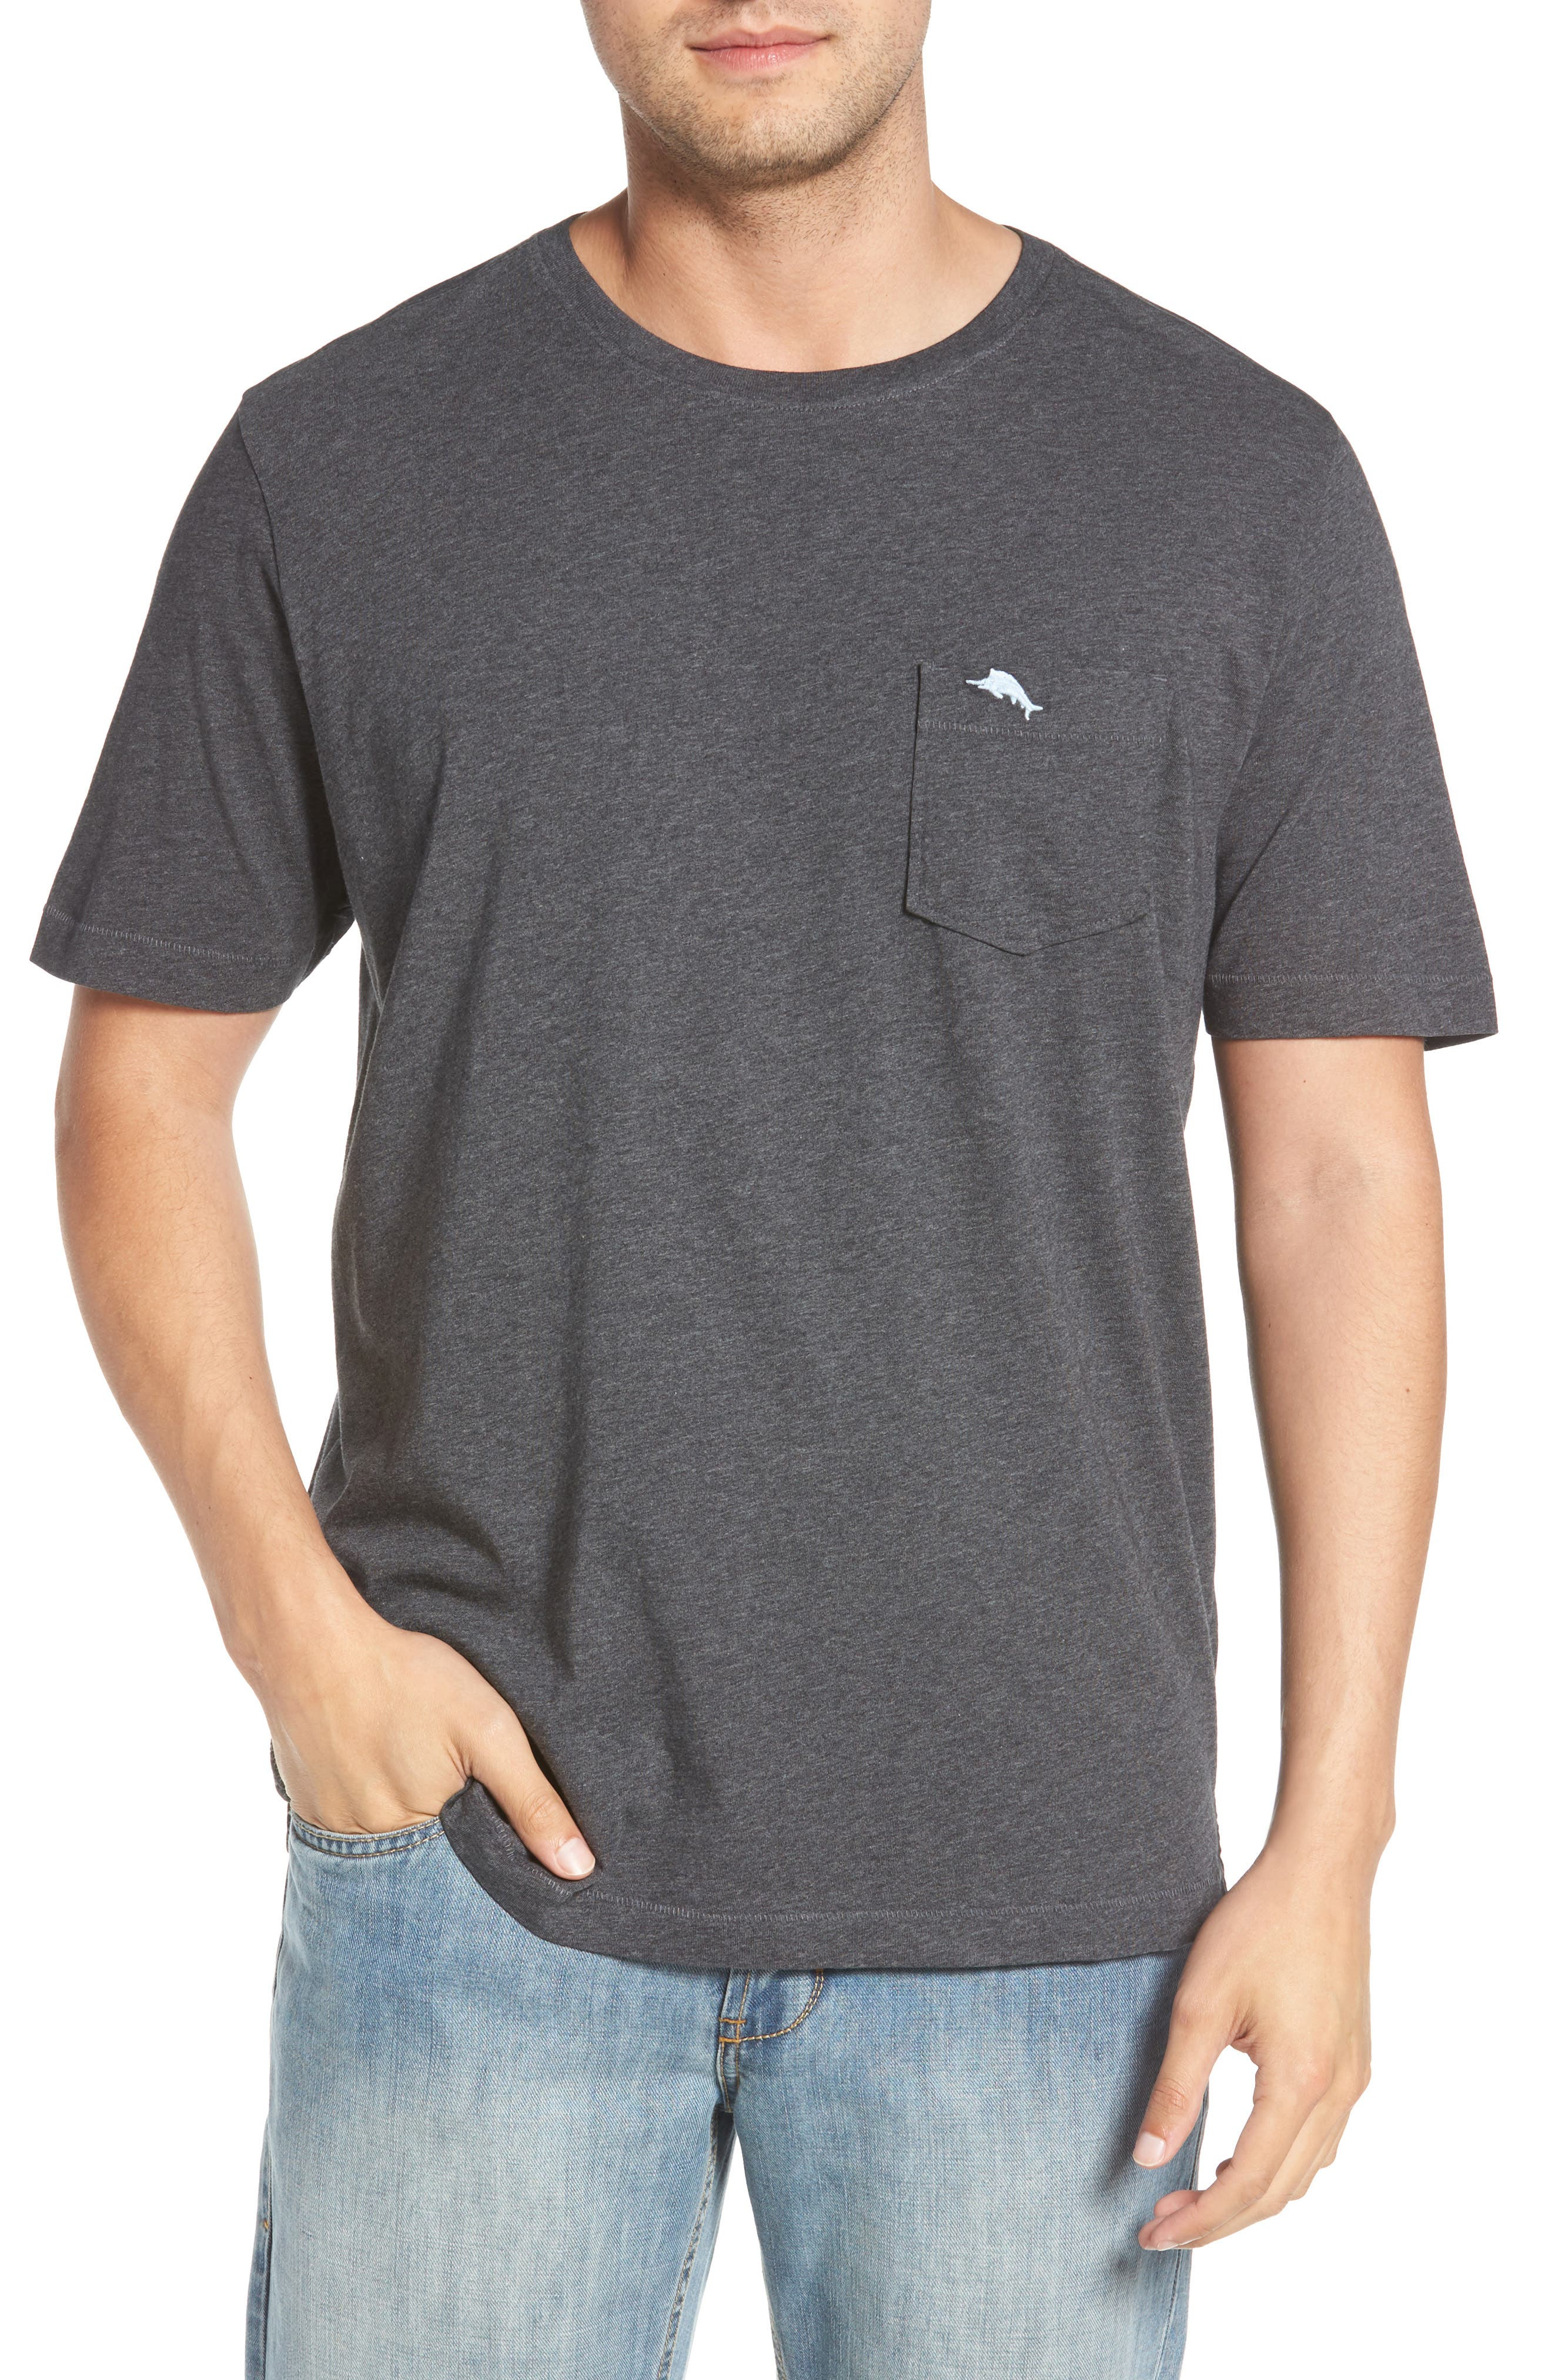 TOMMY BAHAMA, 'New Bali Sky' Original Fit Crewneck Pocket T-Shirt, Main thumbnail 1, color, CHARCOAL HEATHER